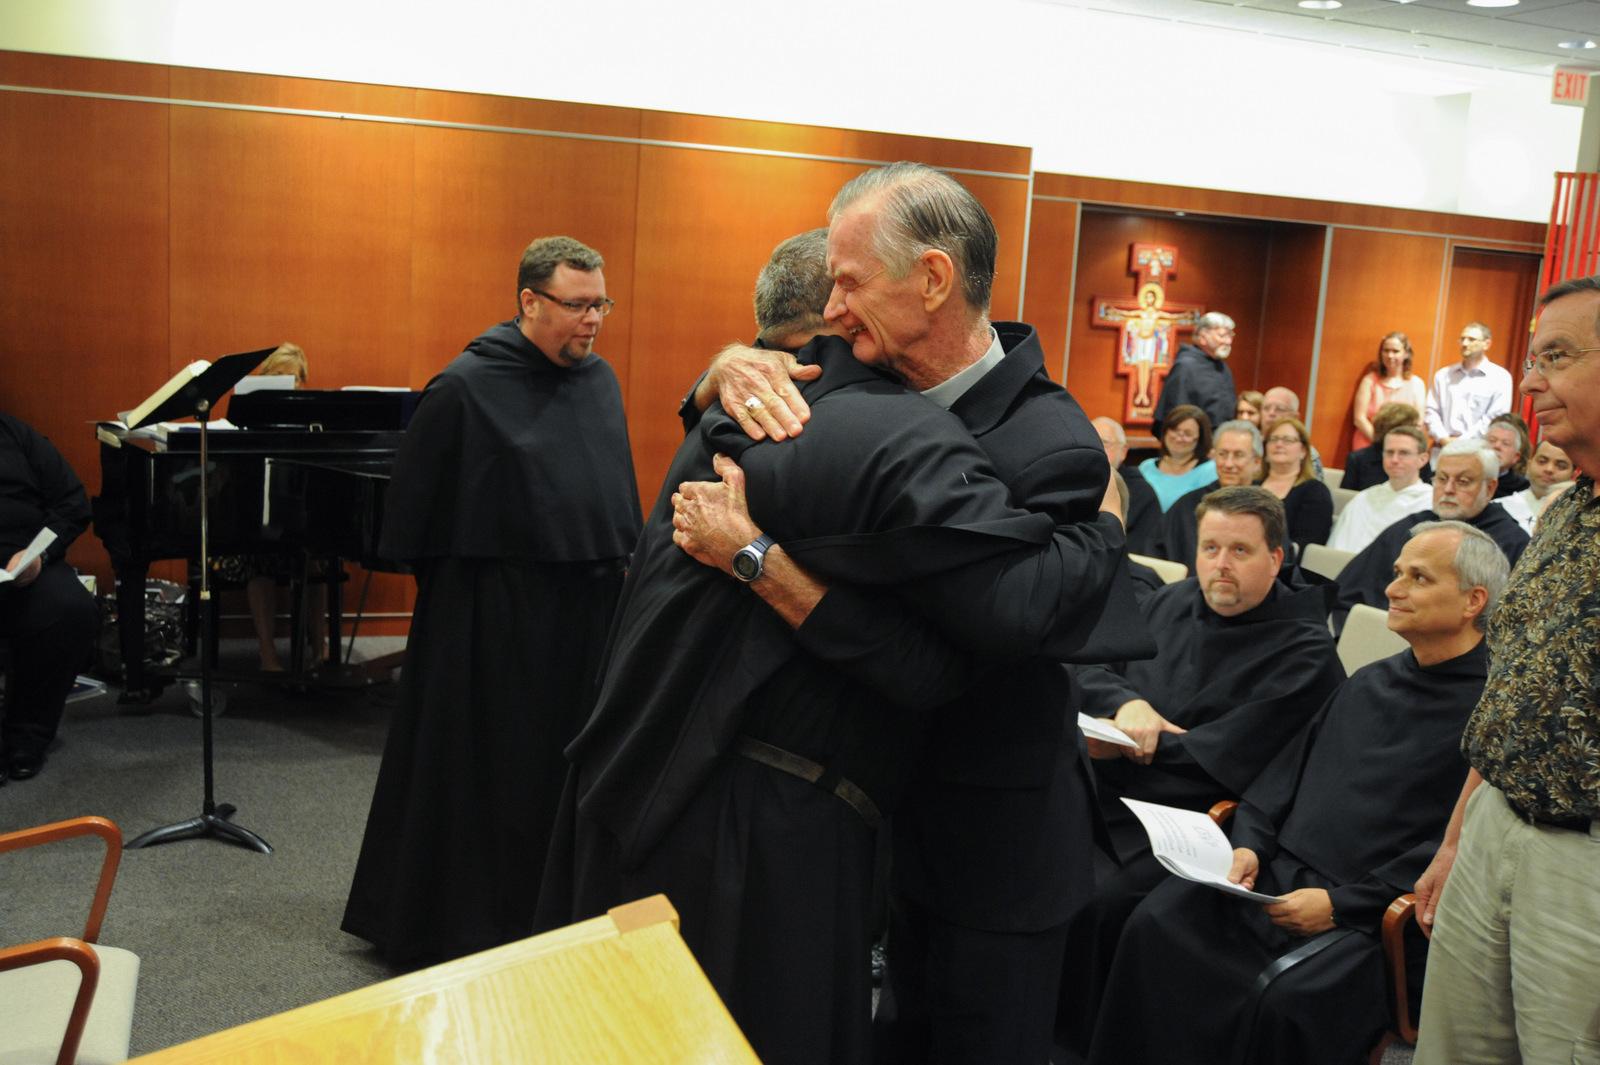 Bishop Dan Turley, O.S.A., congratulates Fr. Bernie Scianna, O.S.A., on his second term as Prior Provincial